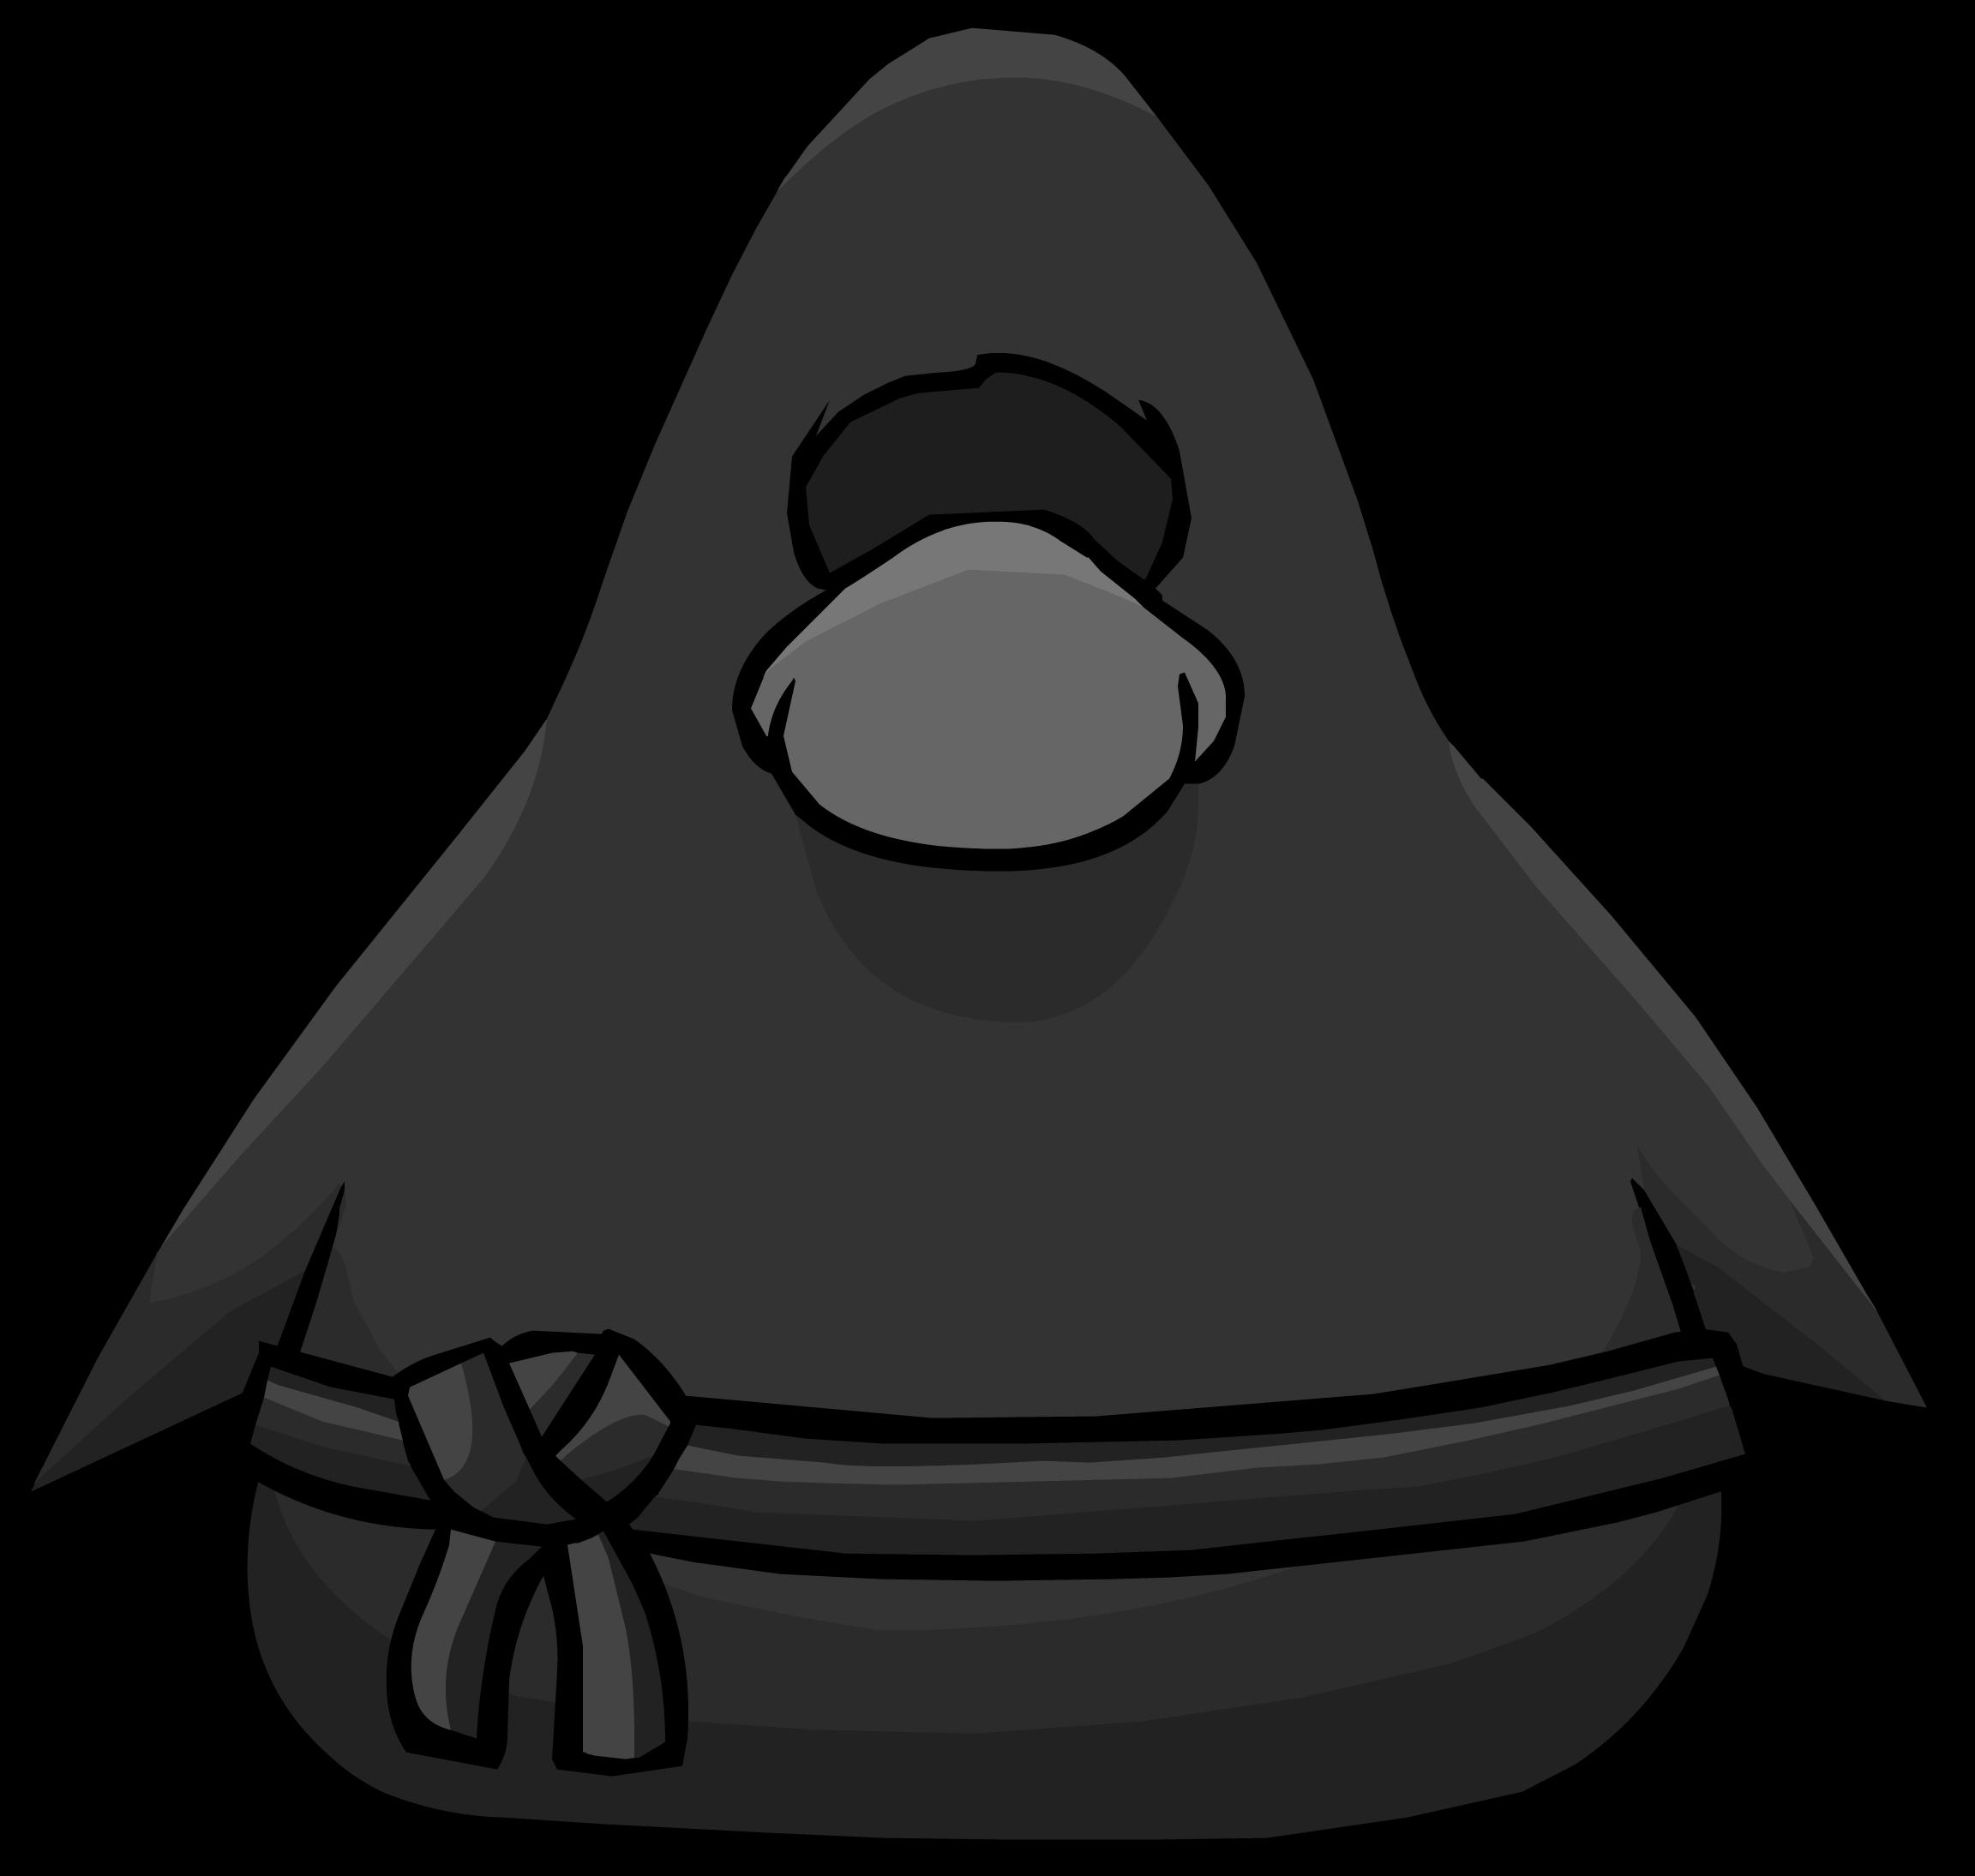 Ninja Outfit | Club Penguin Wiki | FANDOM powered by Wikia